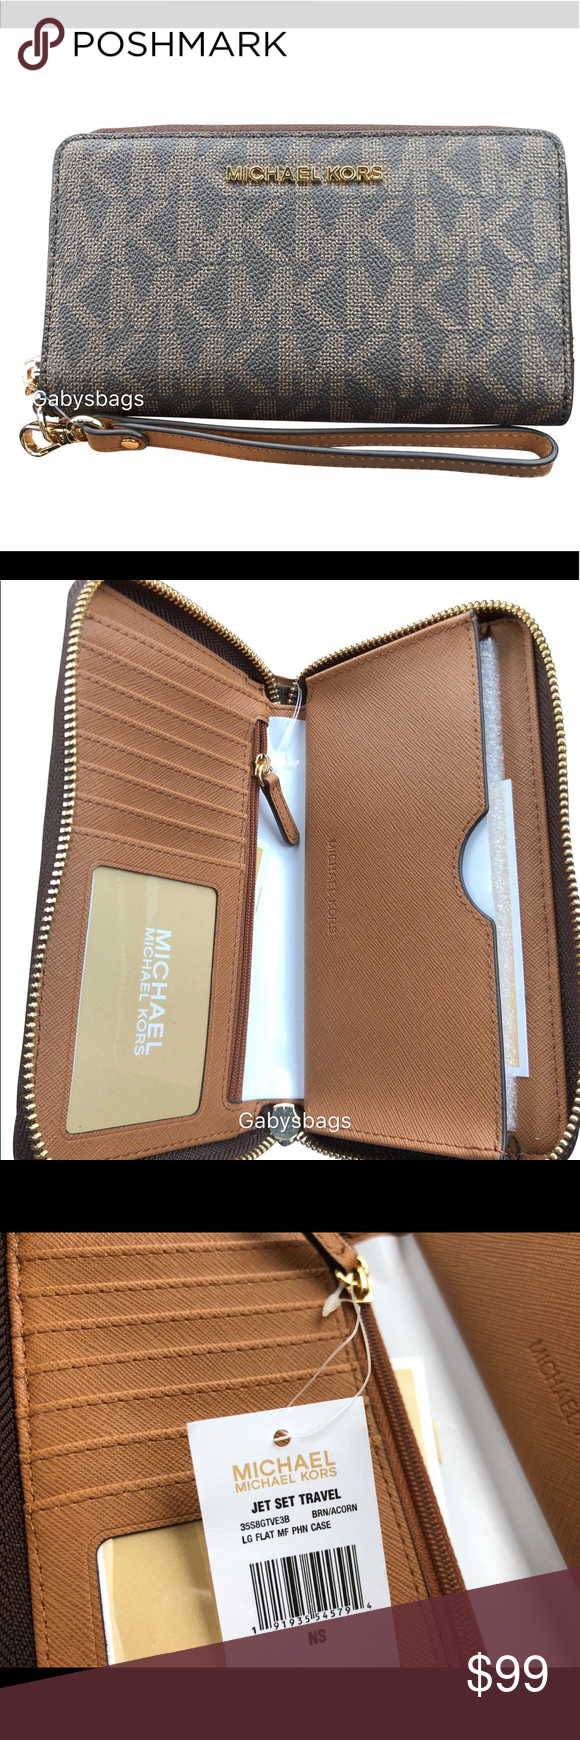 0e6cfefc9cb55e Michael Kors Large Phone Wristlet Brown MK Acorn Color: Brown Zipper  Closure 6 card slots/1 ID Window/1 zip coin compartment 1 phone pocket fits  iPhone 8 ...